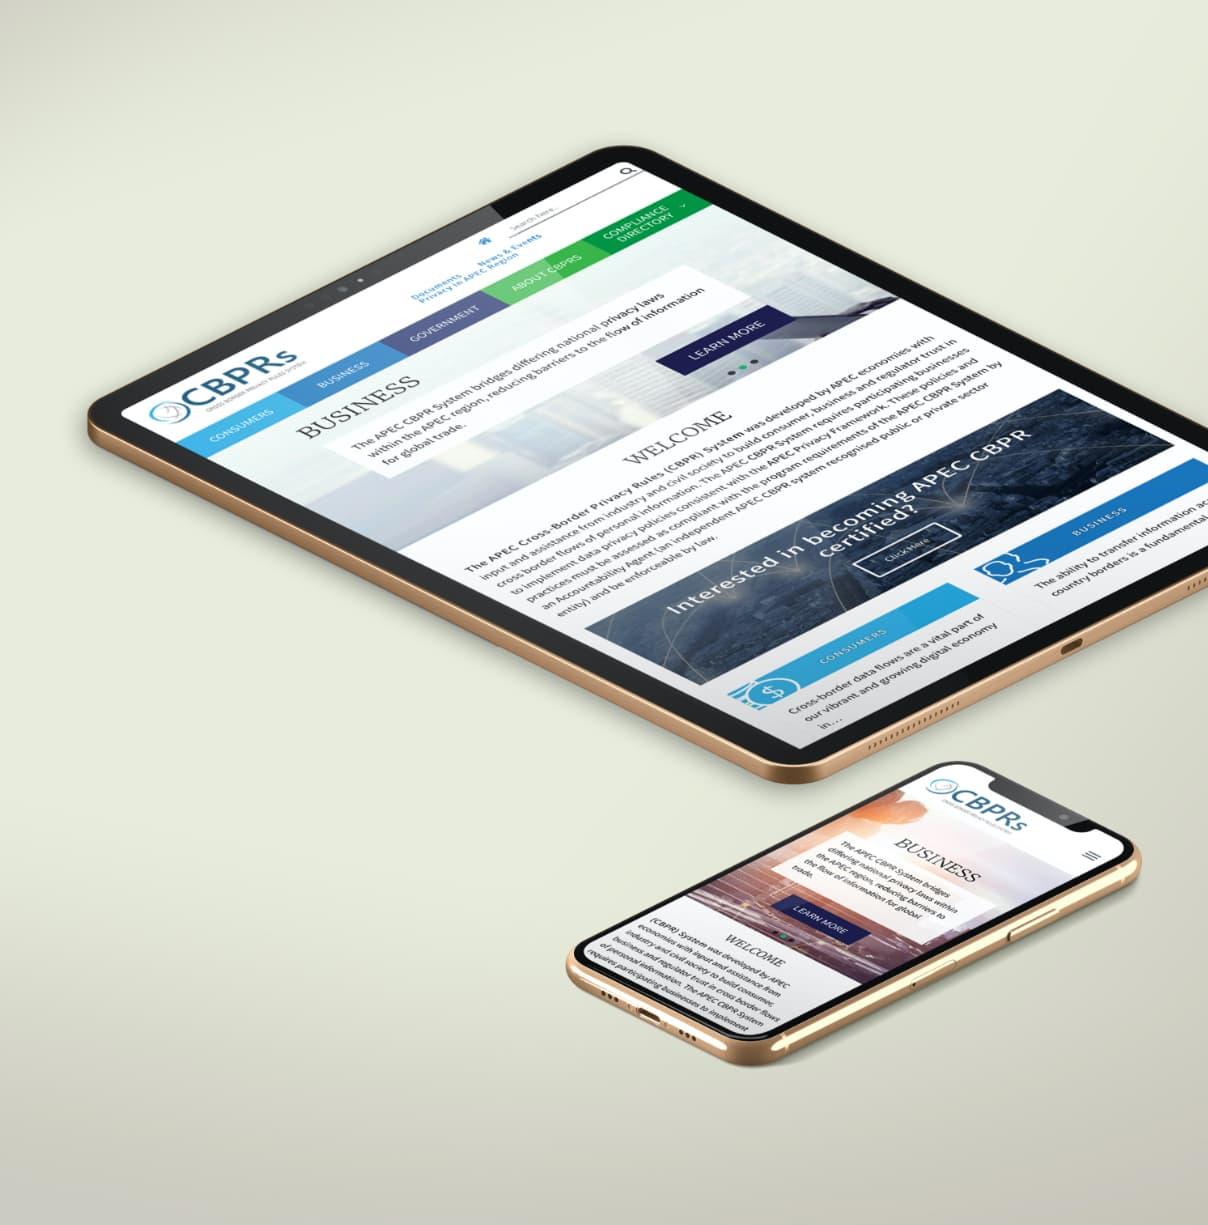 Cross Border Privacy Rules System website design and development using WordPress